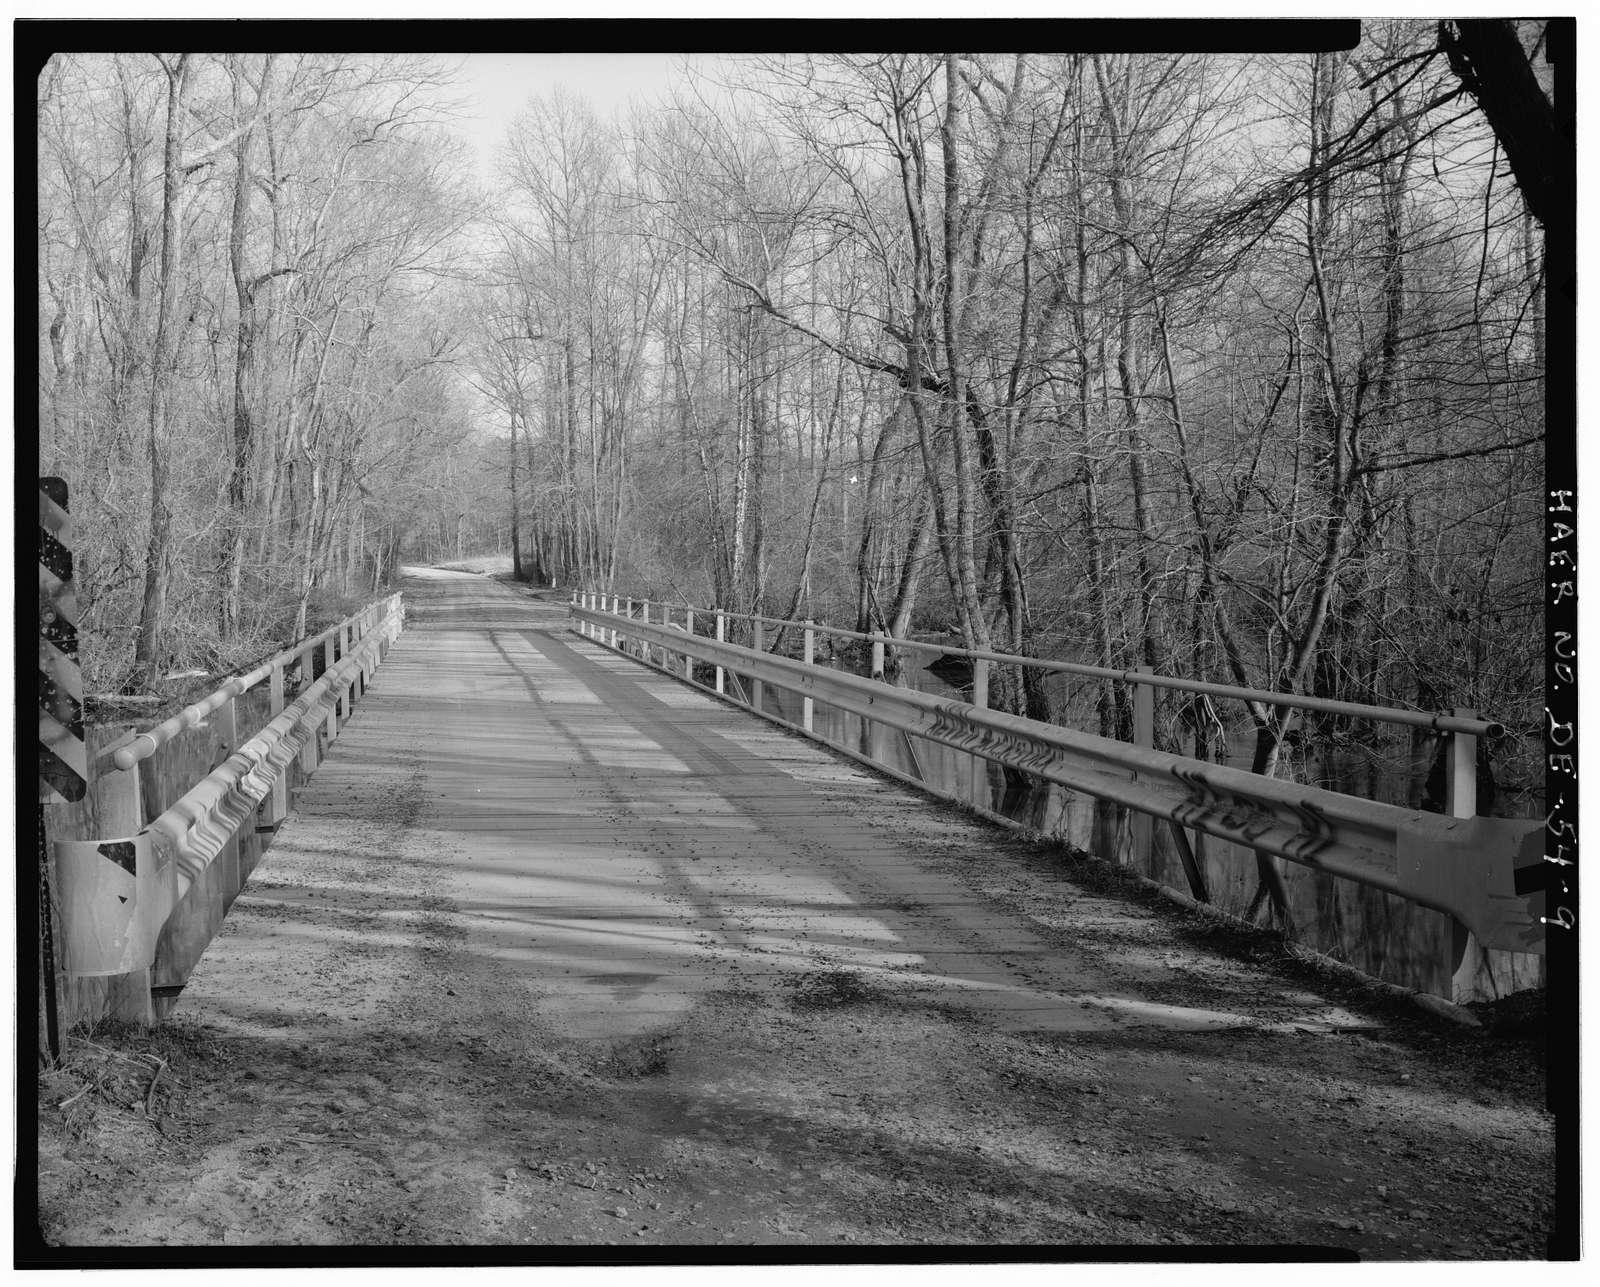 Carter's Bridge, Still Road (Road 211), spanning Choptank River, Sandtown, Kent County, DE